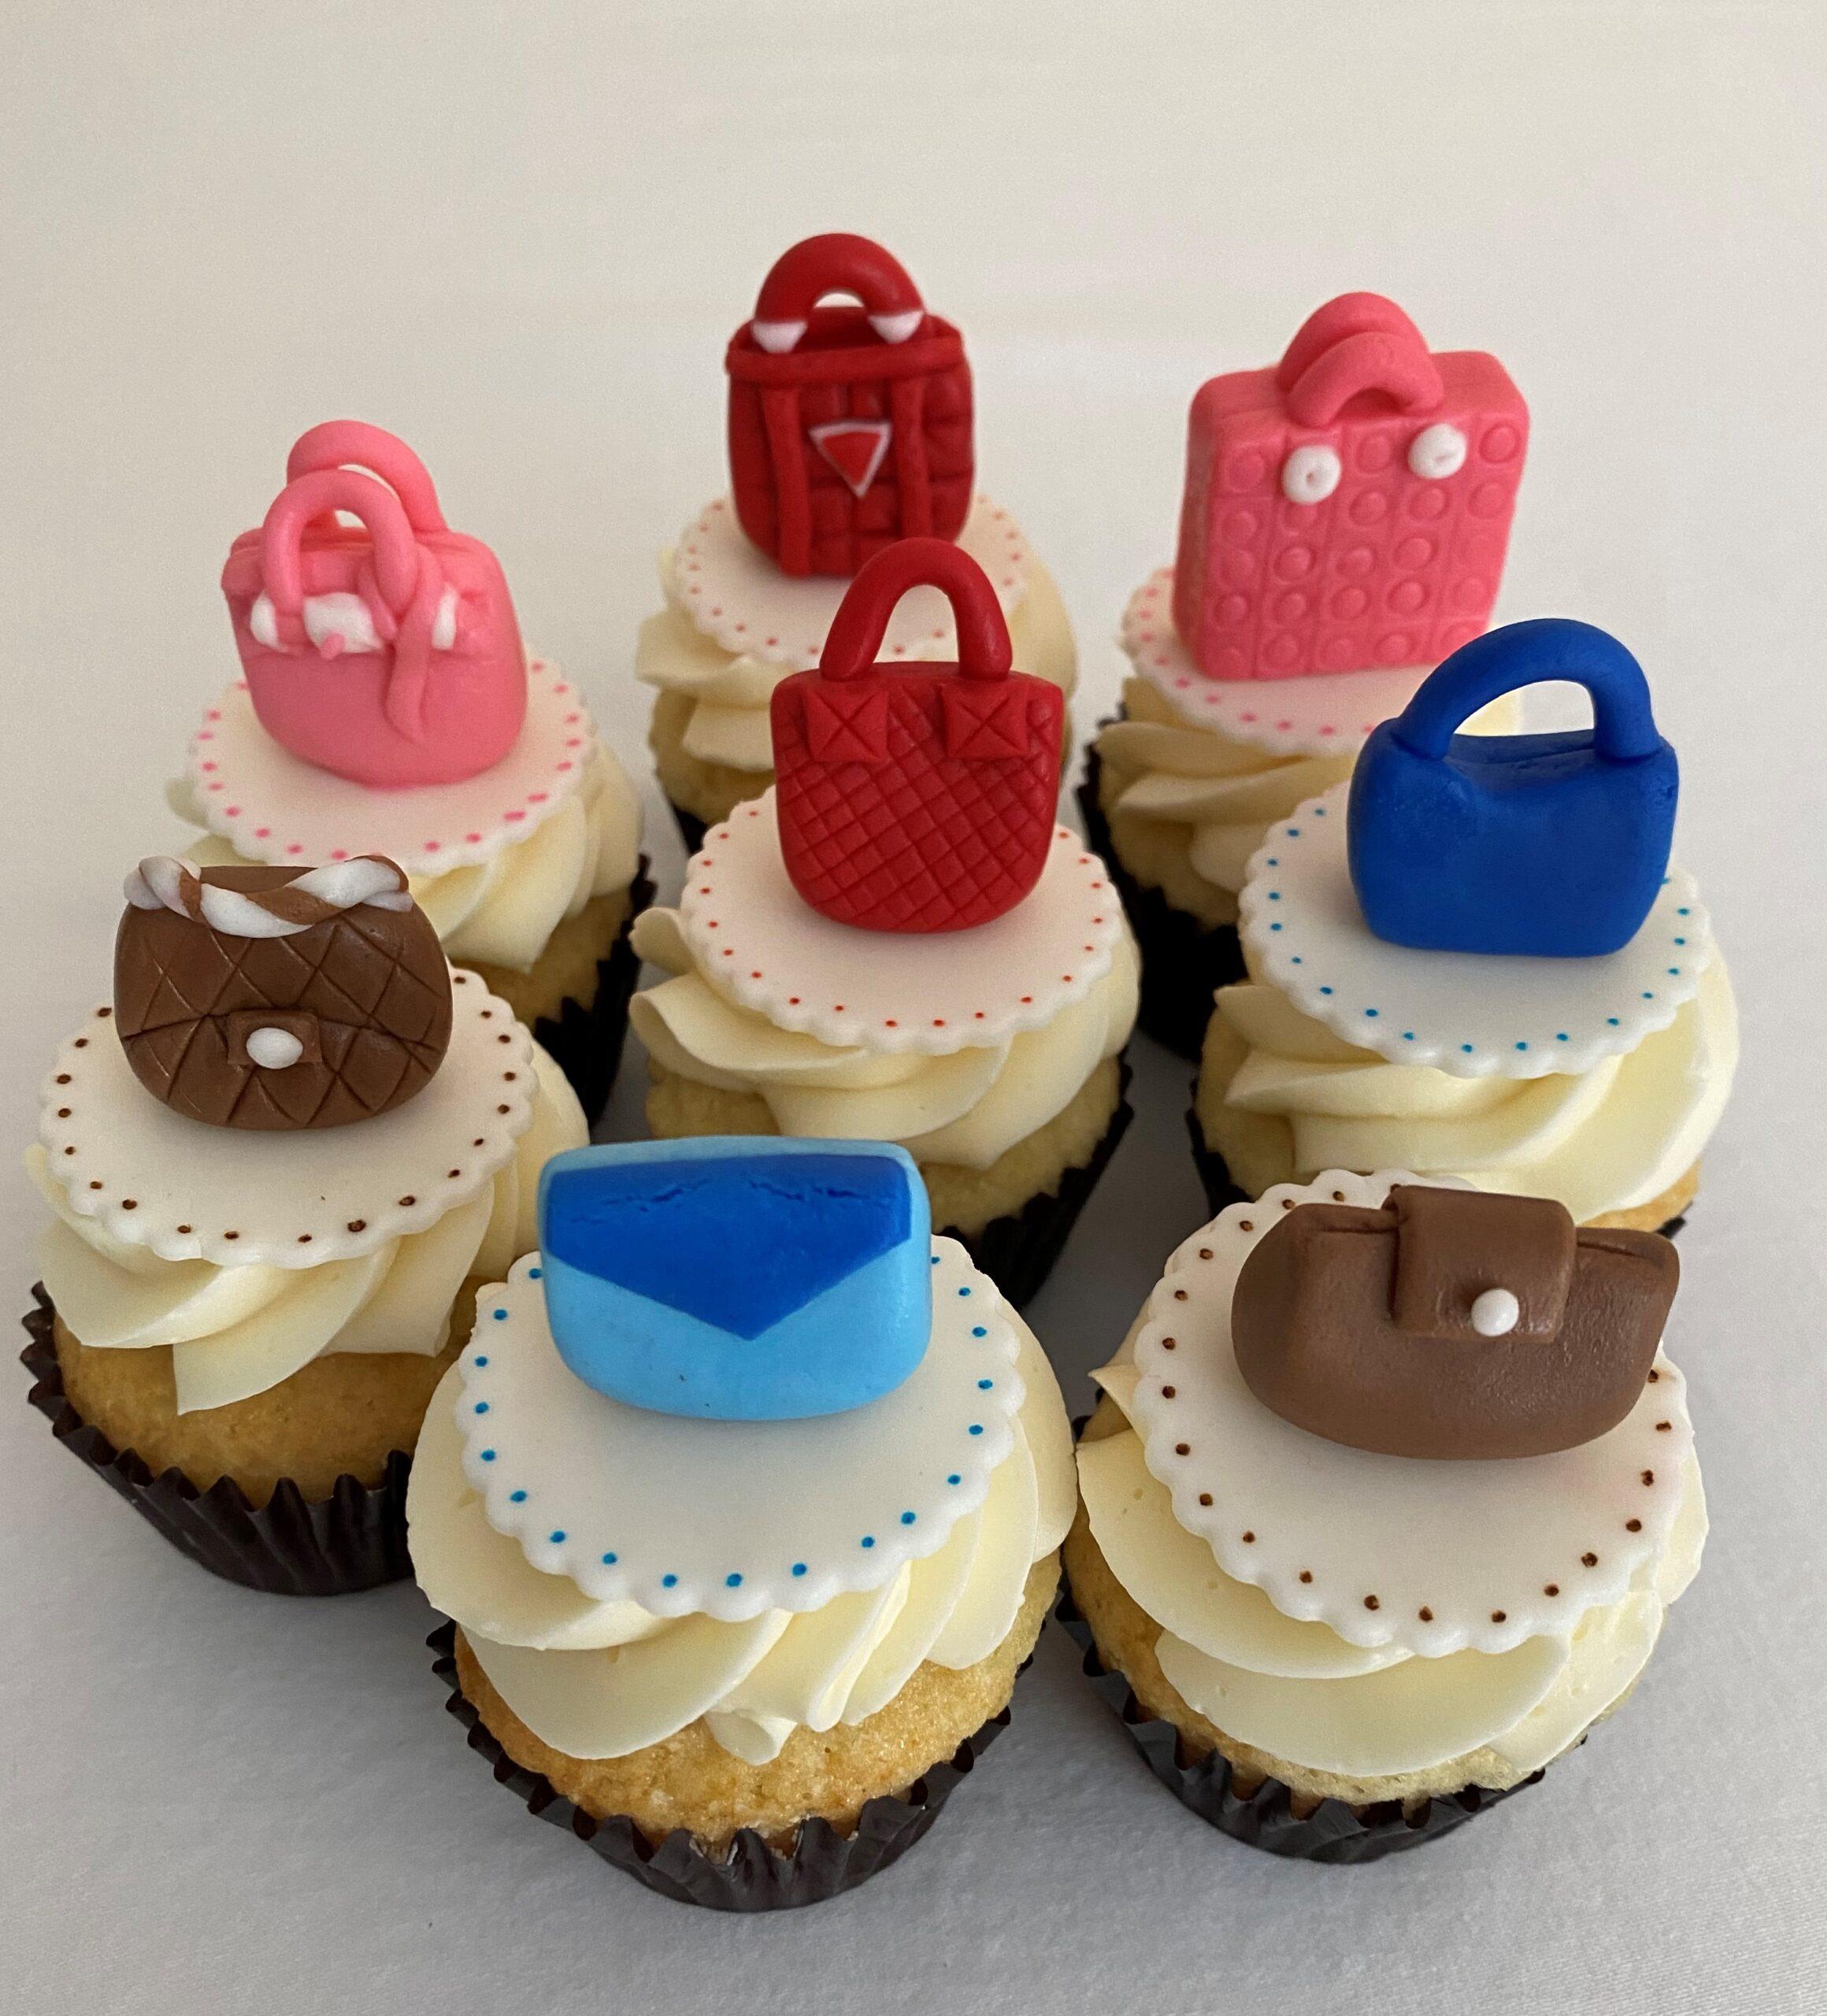 Cupcake of Purses